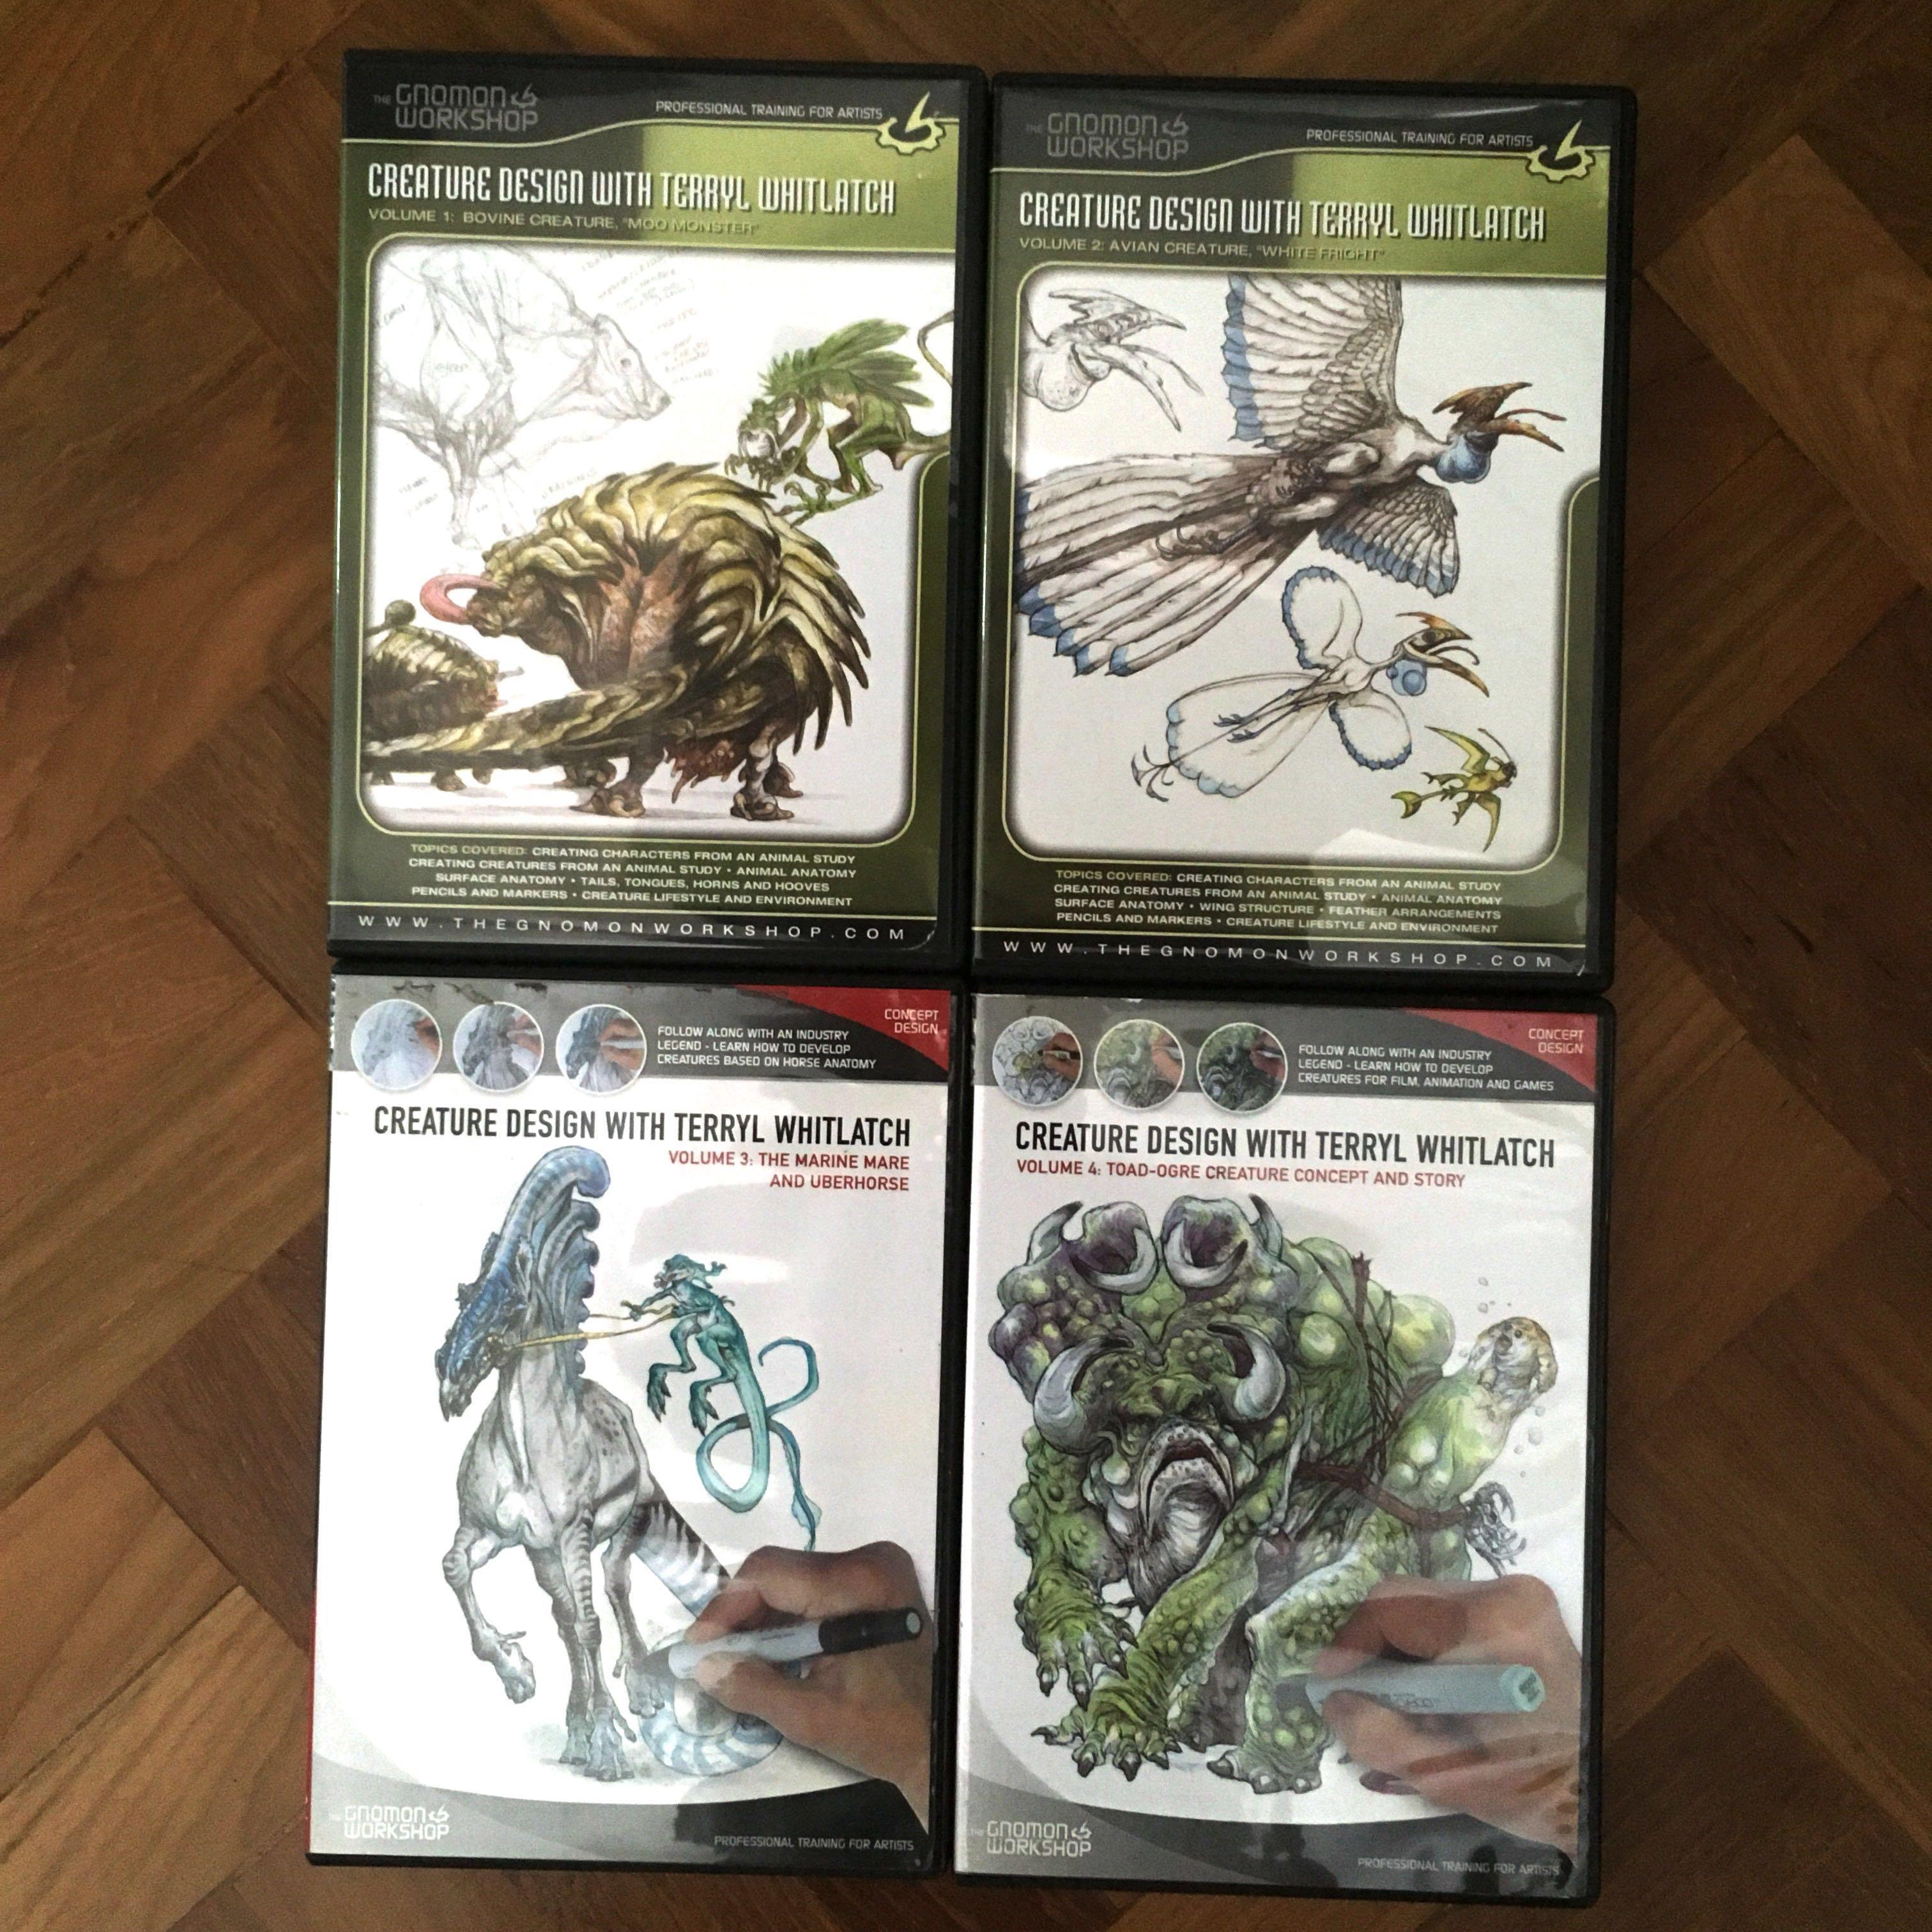 Gnomon Workshop DVDs - Creature Design with Terry's